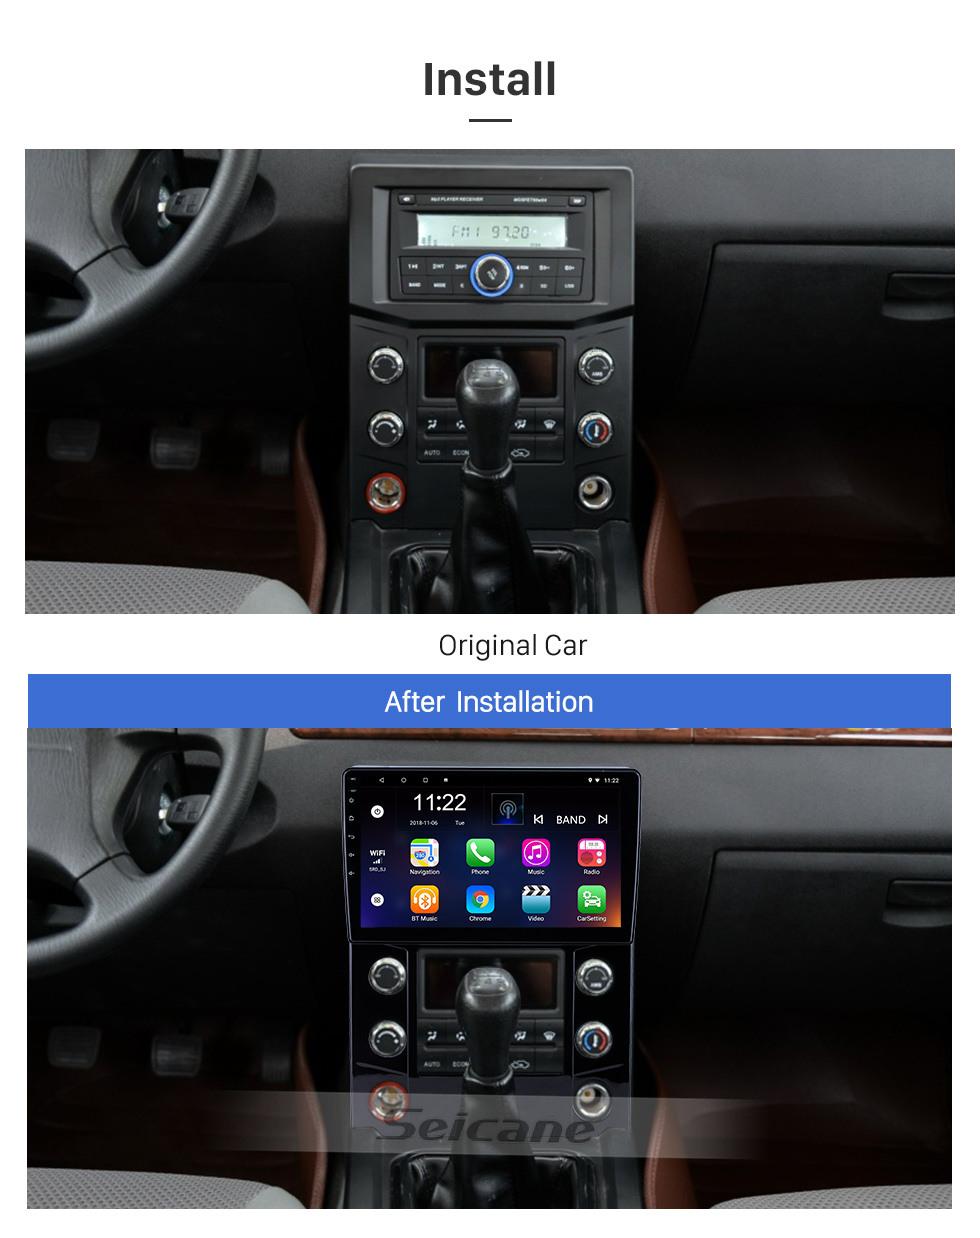 Seicane OEM 10,1 Zoll Android 10.0 für 2015 JDMC T5 Radio Bluetooth WIFI HD Touchscreen GPS Navigationssystem Unterstützung Carplay Rückfahrkamera